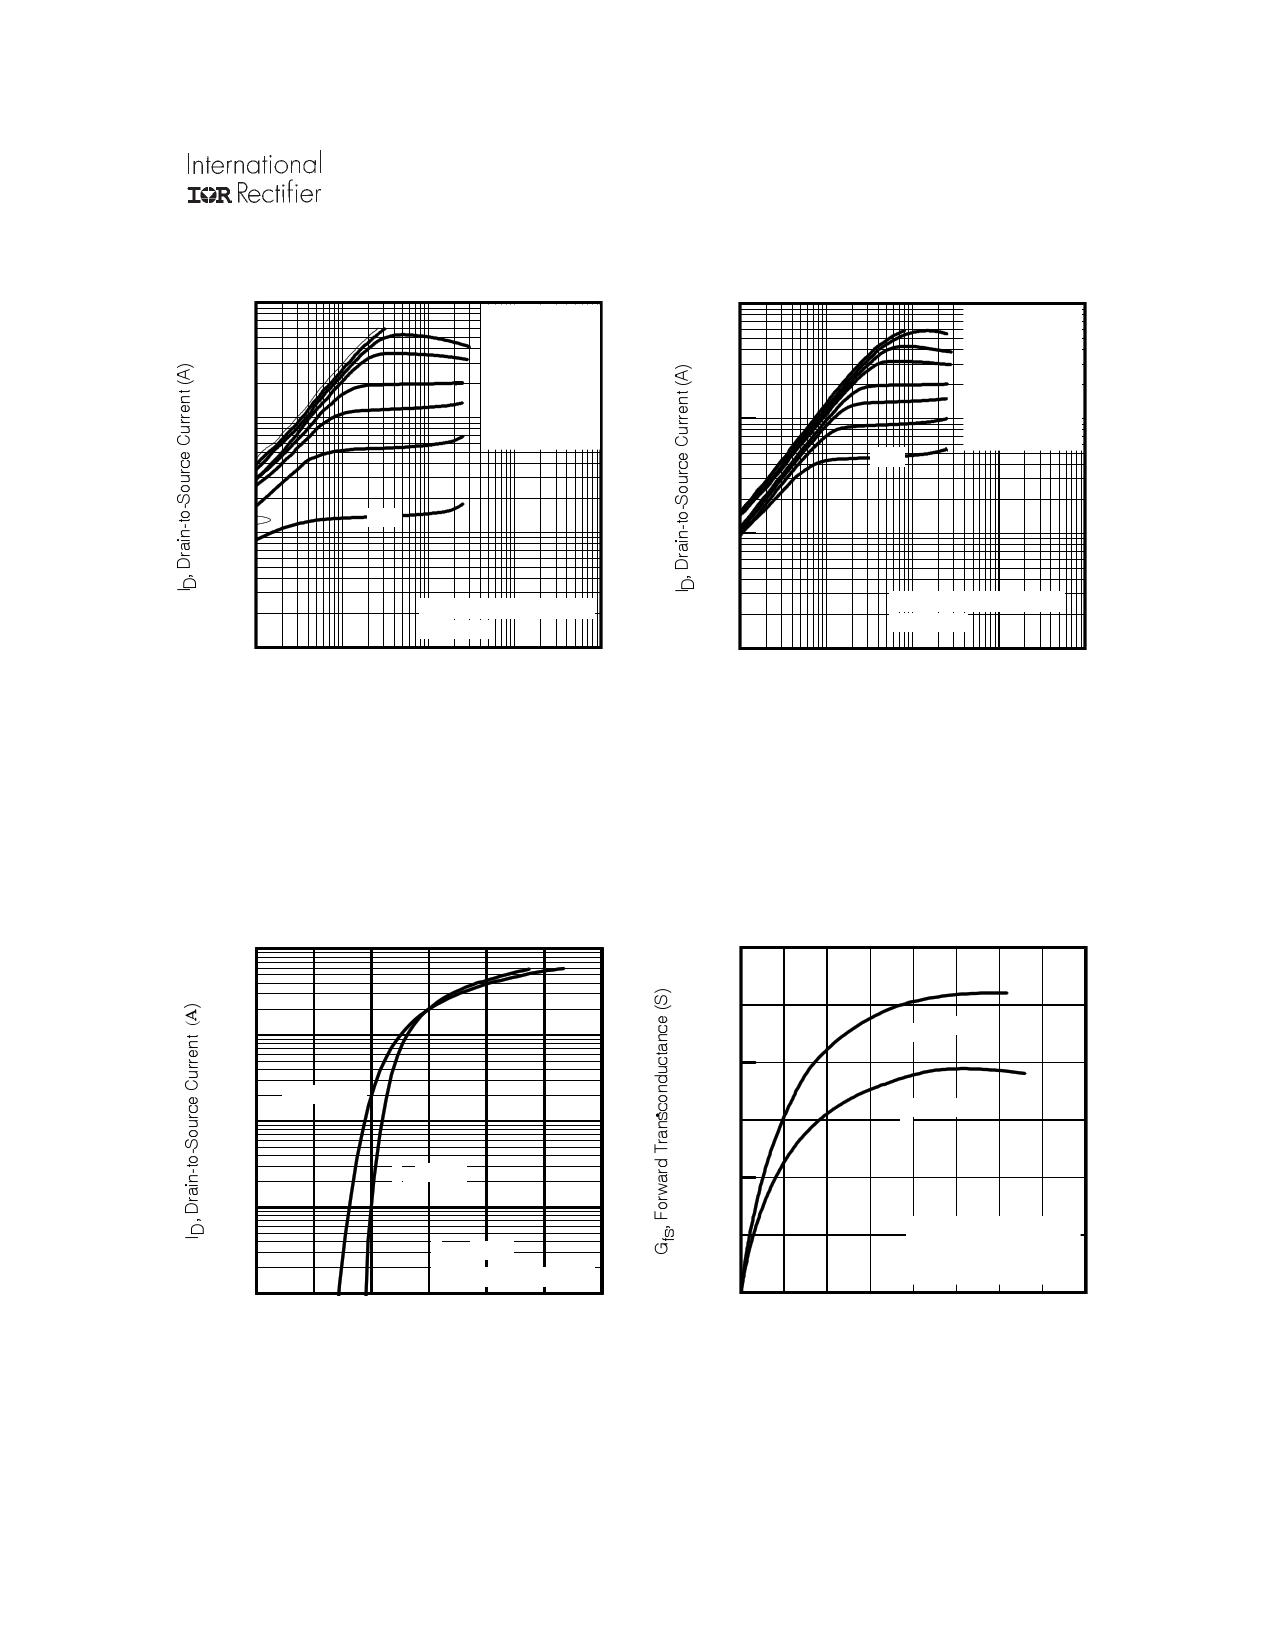 IRF1405ZS-7P pdf, ピン配列